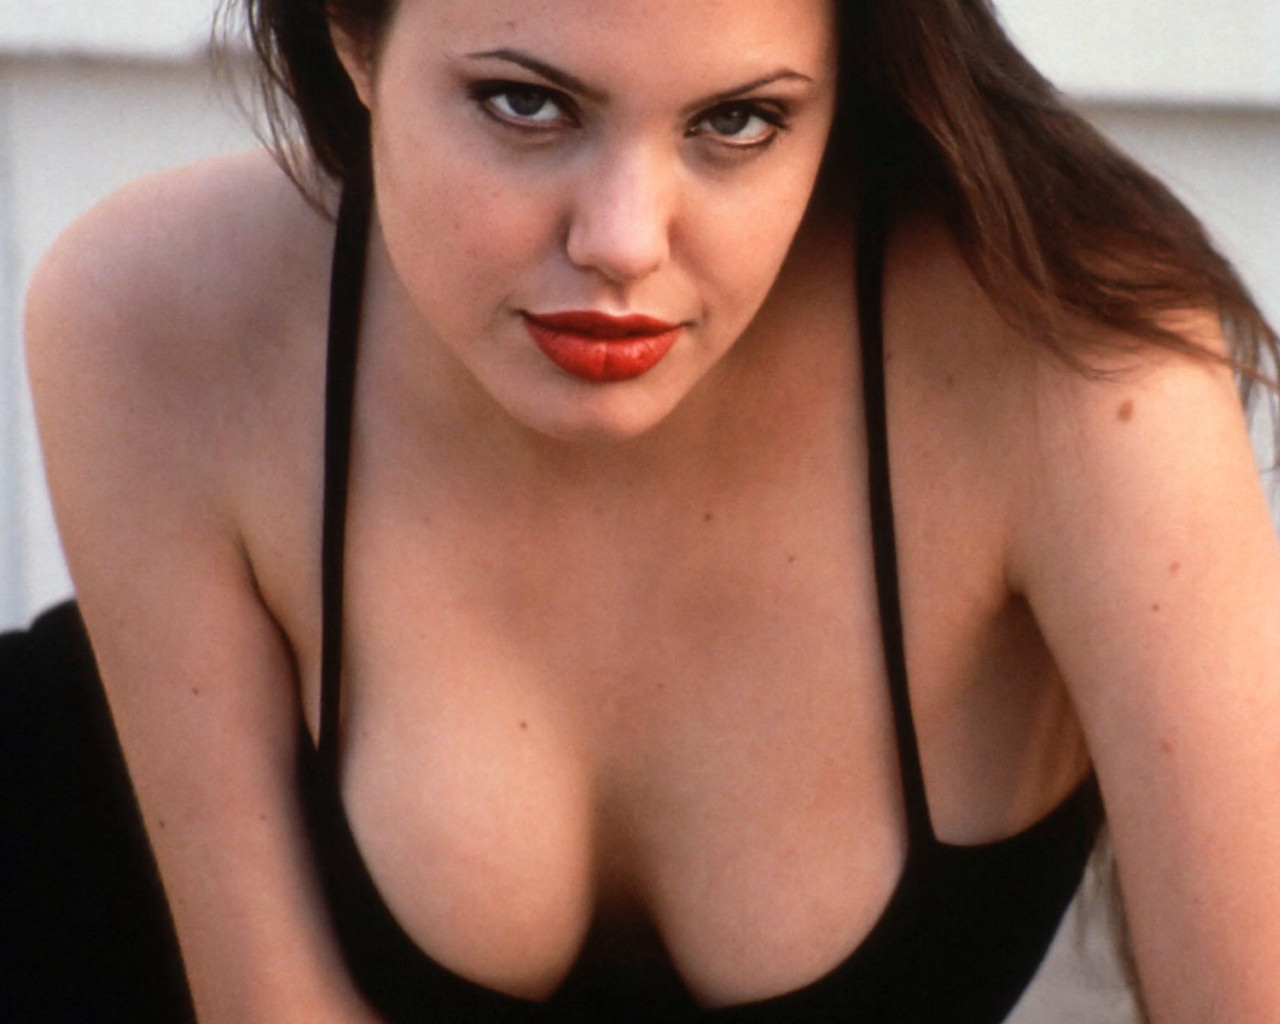 http://4.bp.blogspot.com/_UfzoKj5Ufv0/TMJ12QEI1rI/AAAAAAAAAFw/PNWfL7bS63I/s1600/angelina_jolie_054.jpg